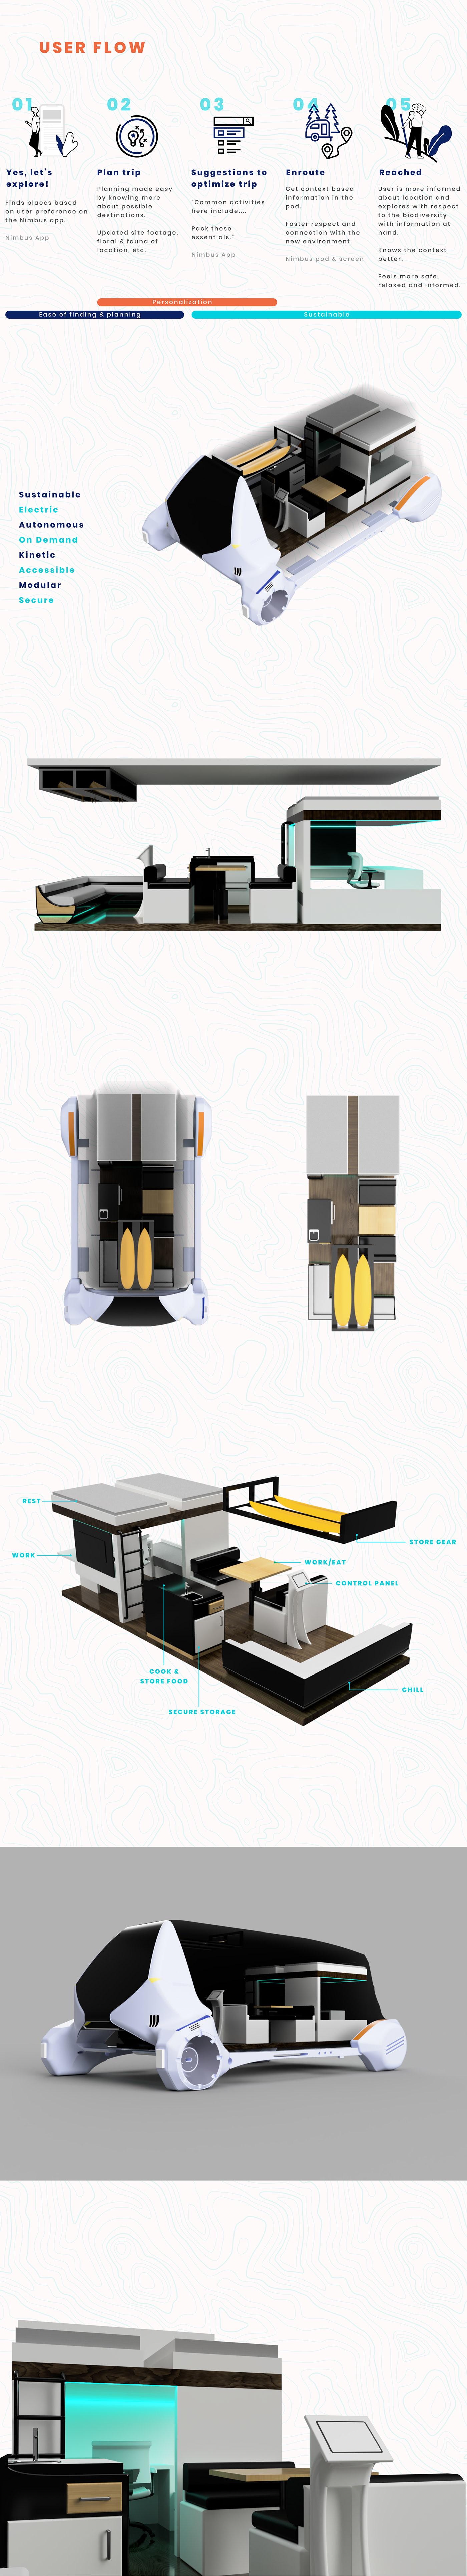 Automotive design camping futuristic industrial design  outdoors ui design UX design